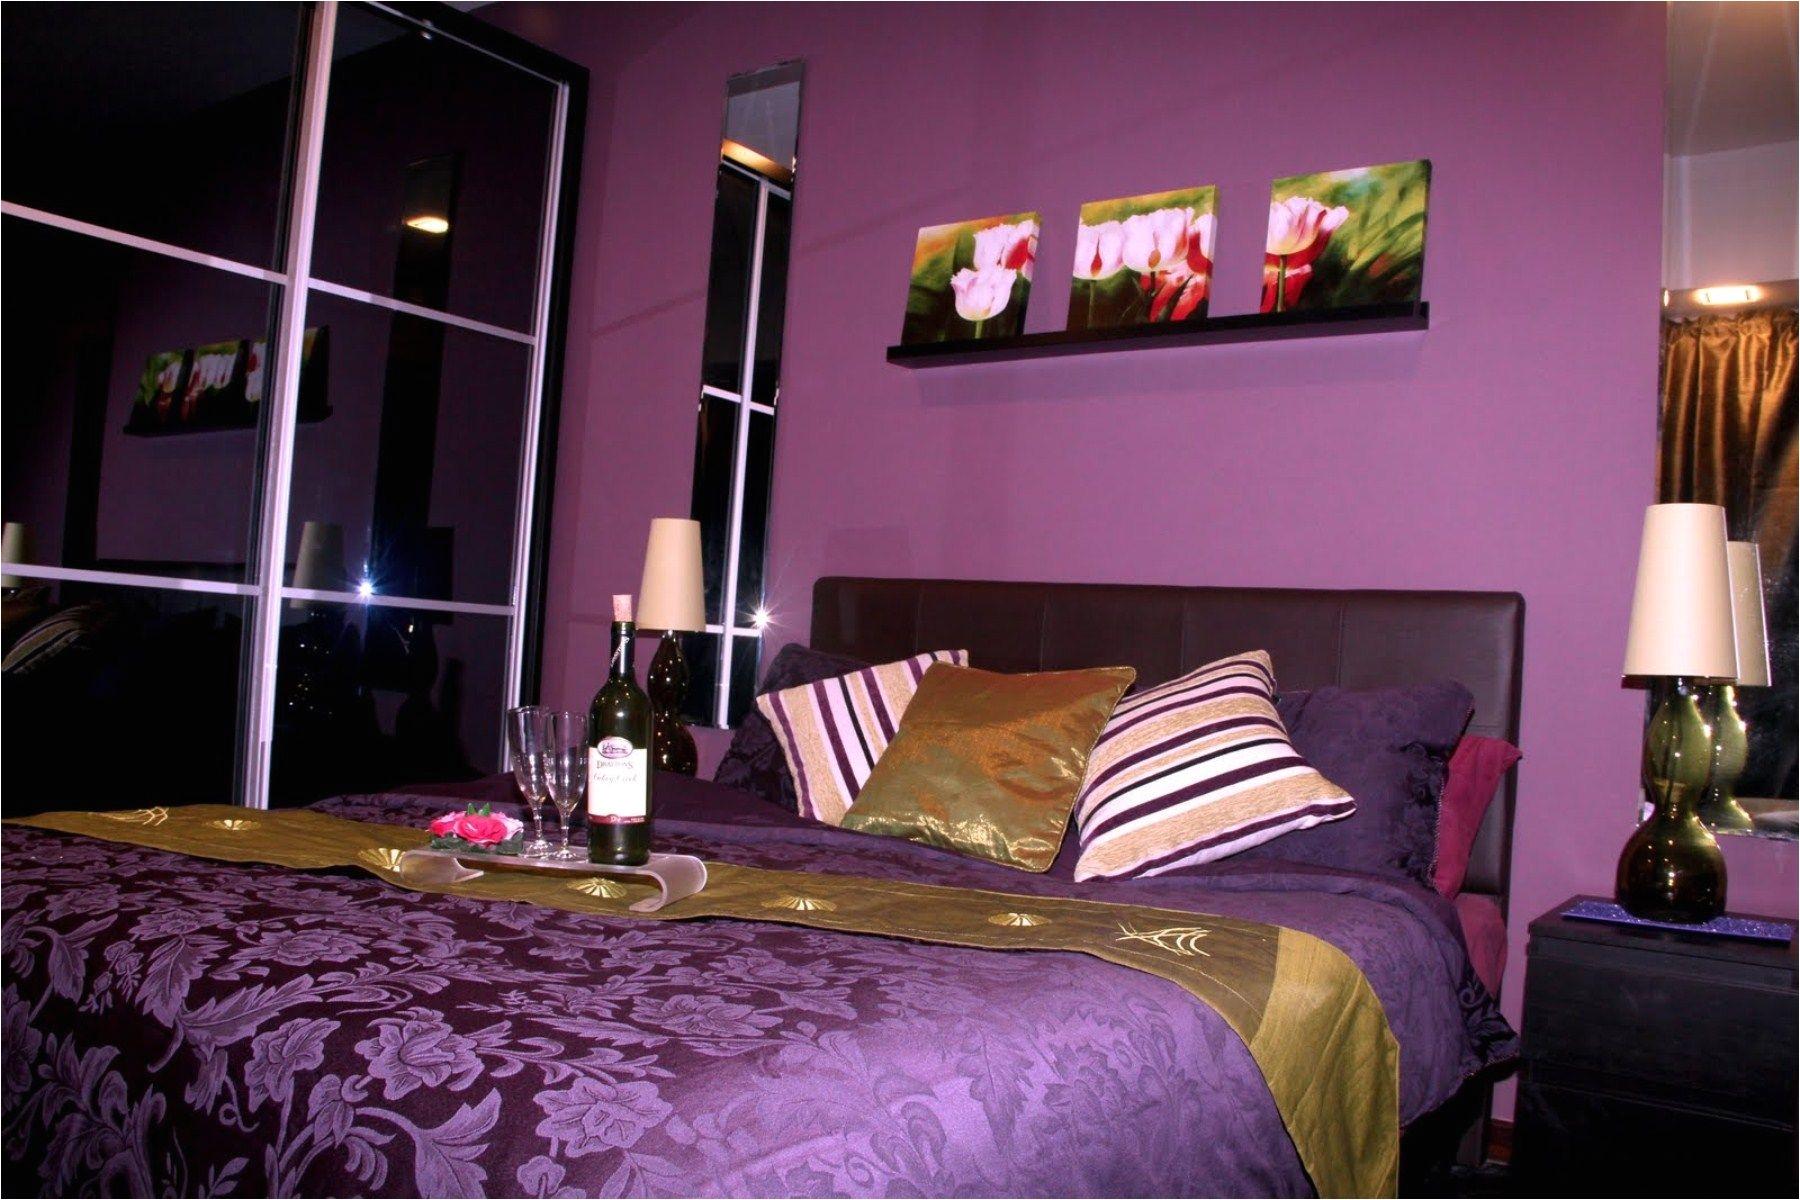 Bedroom Romantic Purple Bedroom Ideas For Valentine Days With Black Furniture Design Purple Bedroom Ideas for Teenage Girls